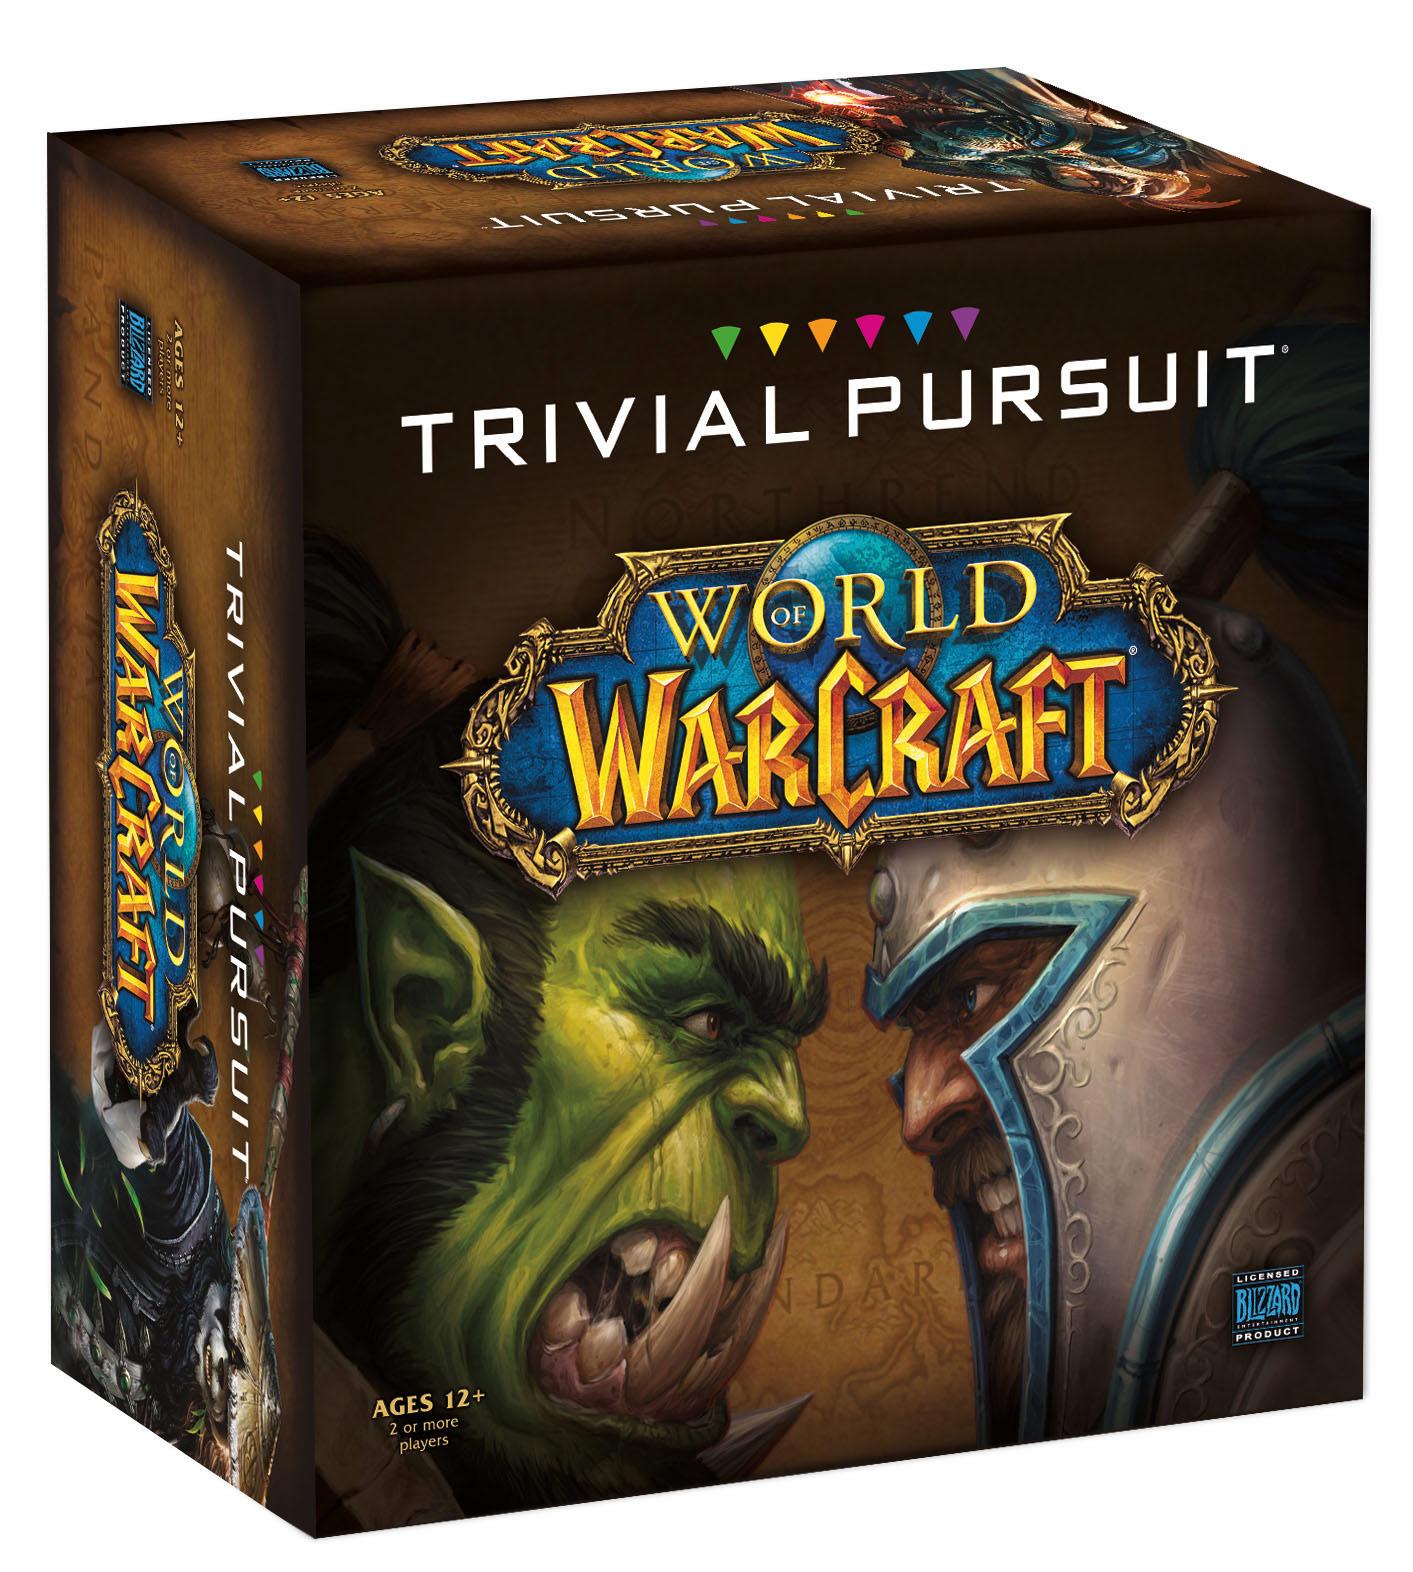 Visuel du Trivial Pursuit World of Warcraft.